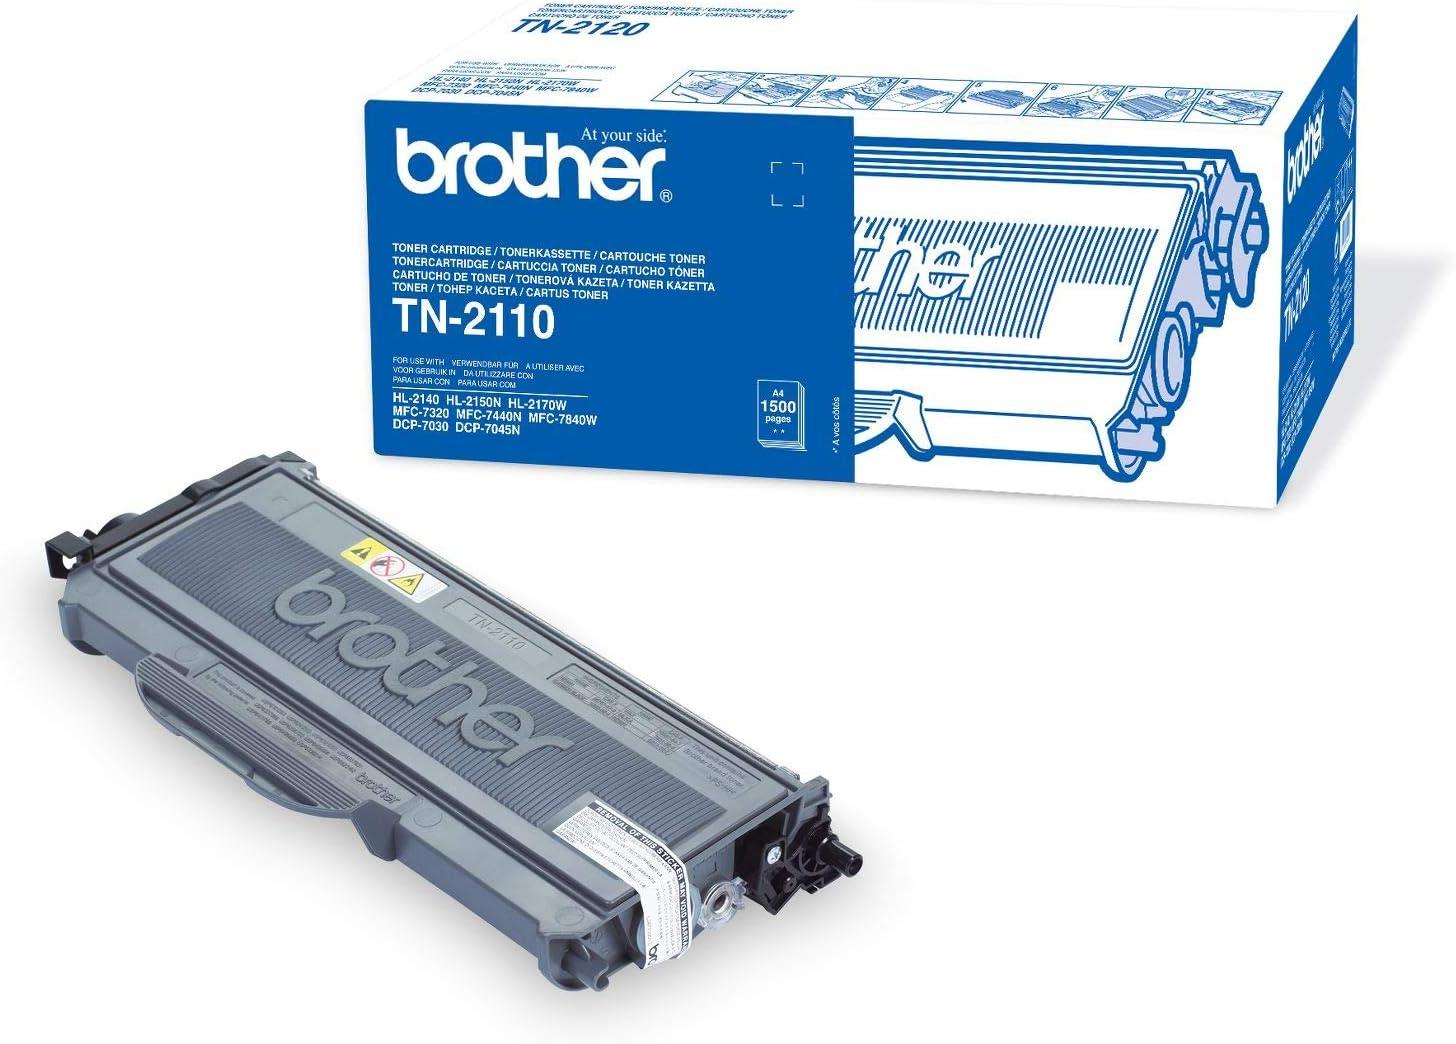 Kompatible Tonerkartusche f/ür Brother DCP-7030 DCP-7040 DCP-7045N HL-2140 HL-2150N HL-2170N HL-2170W MFC-7320 TN2120 TN-2120 XXL 5.200 Seiten Black